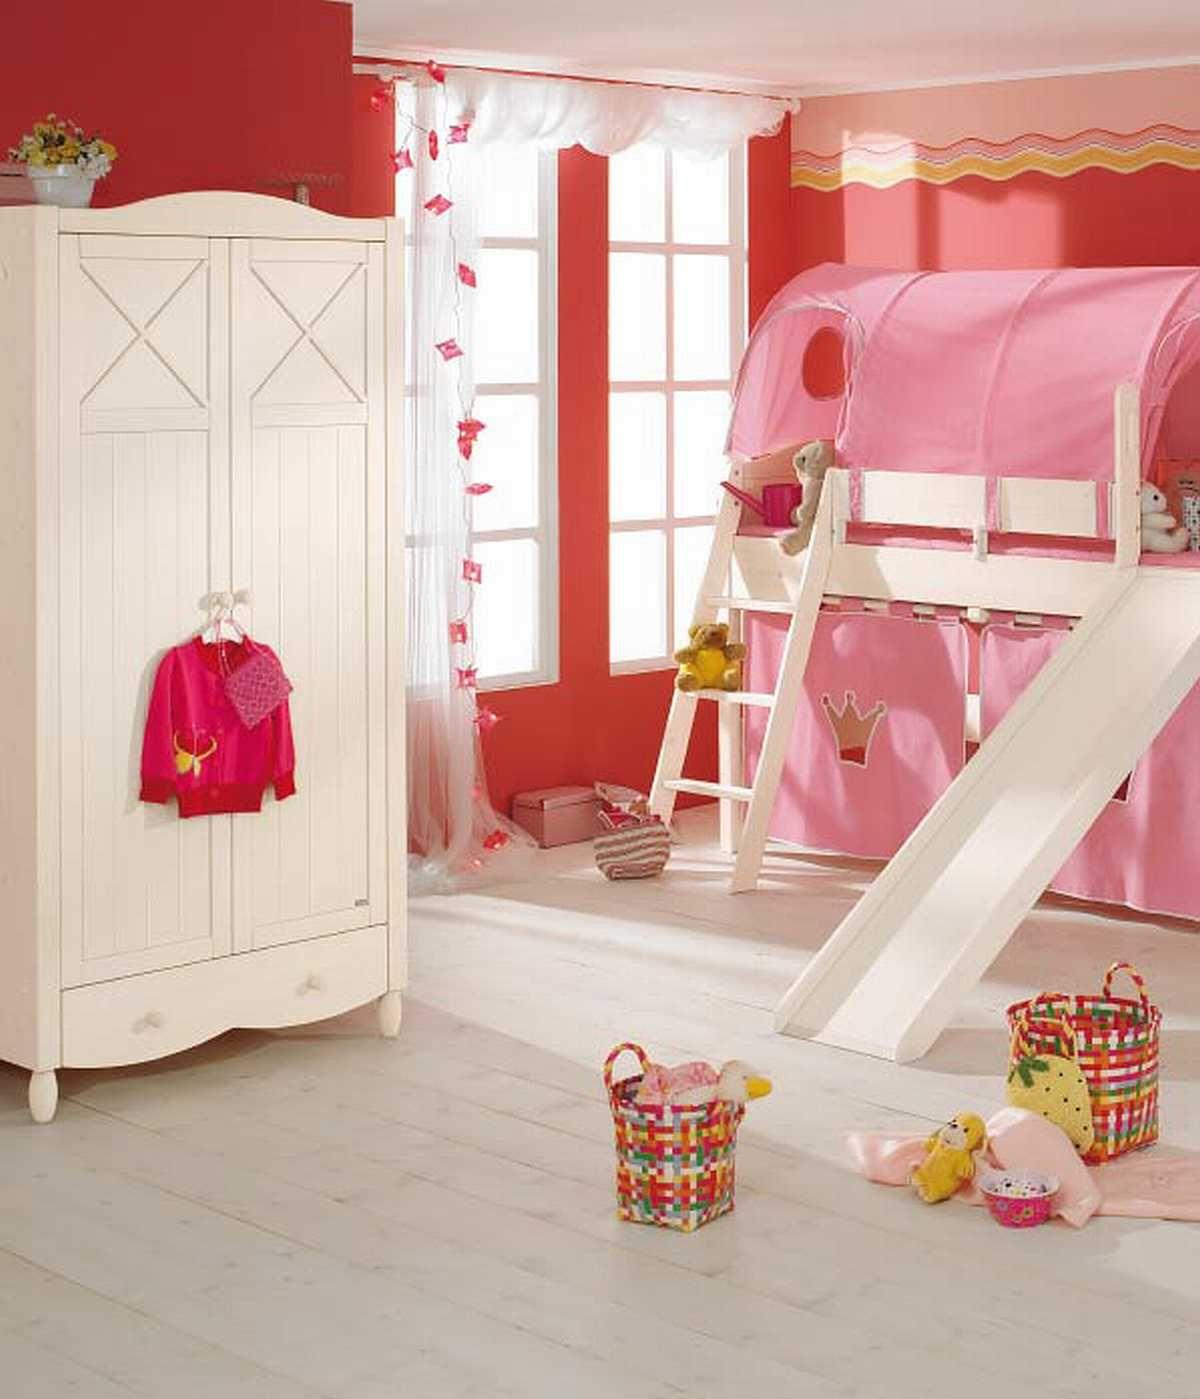 Coolest Kids Room: Cool Kids Bedroom Ideas